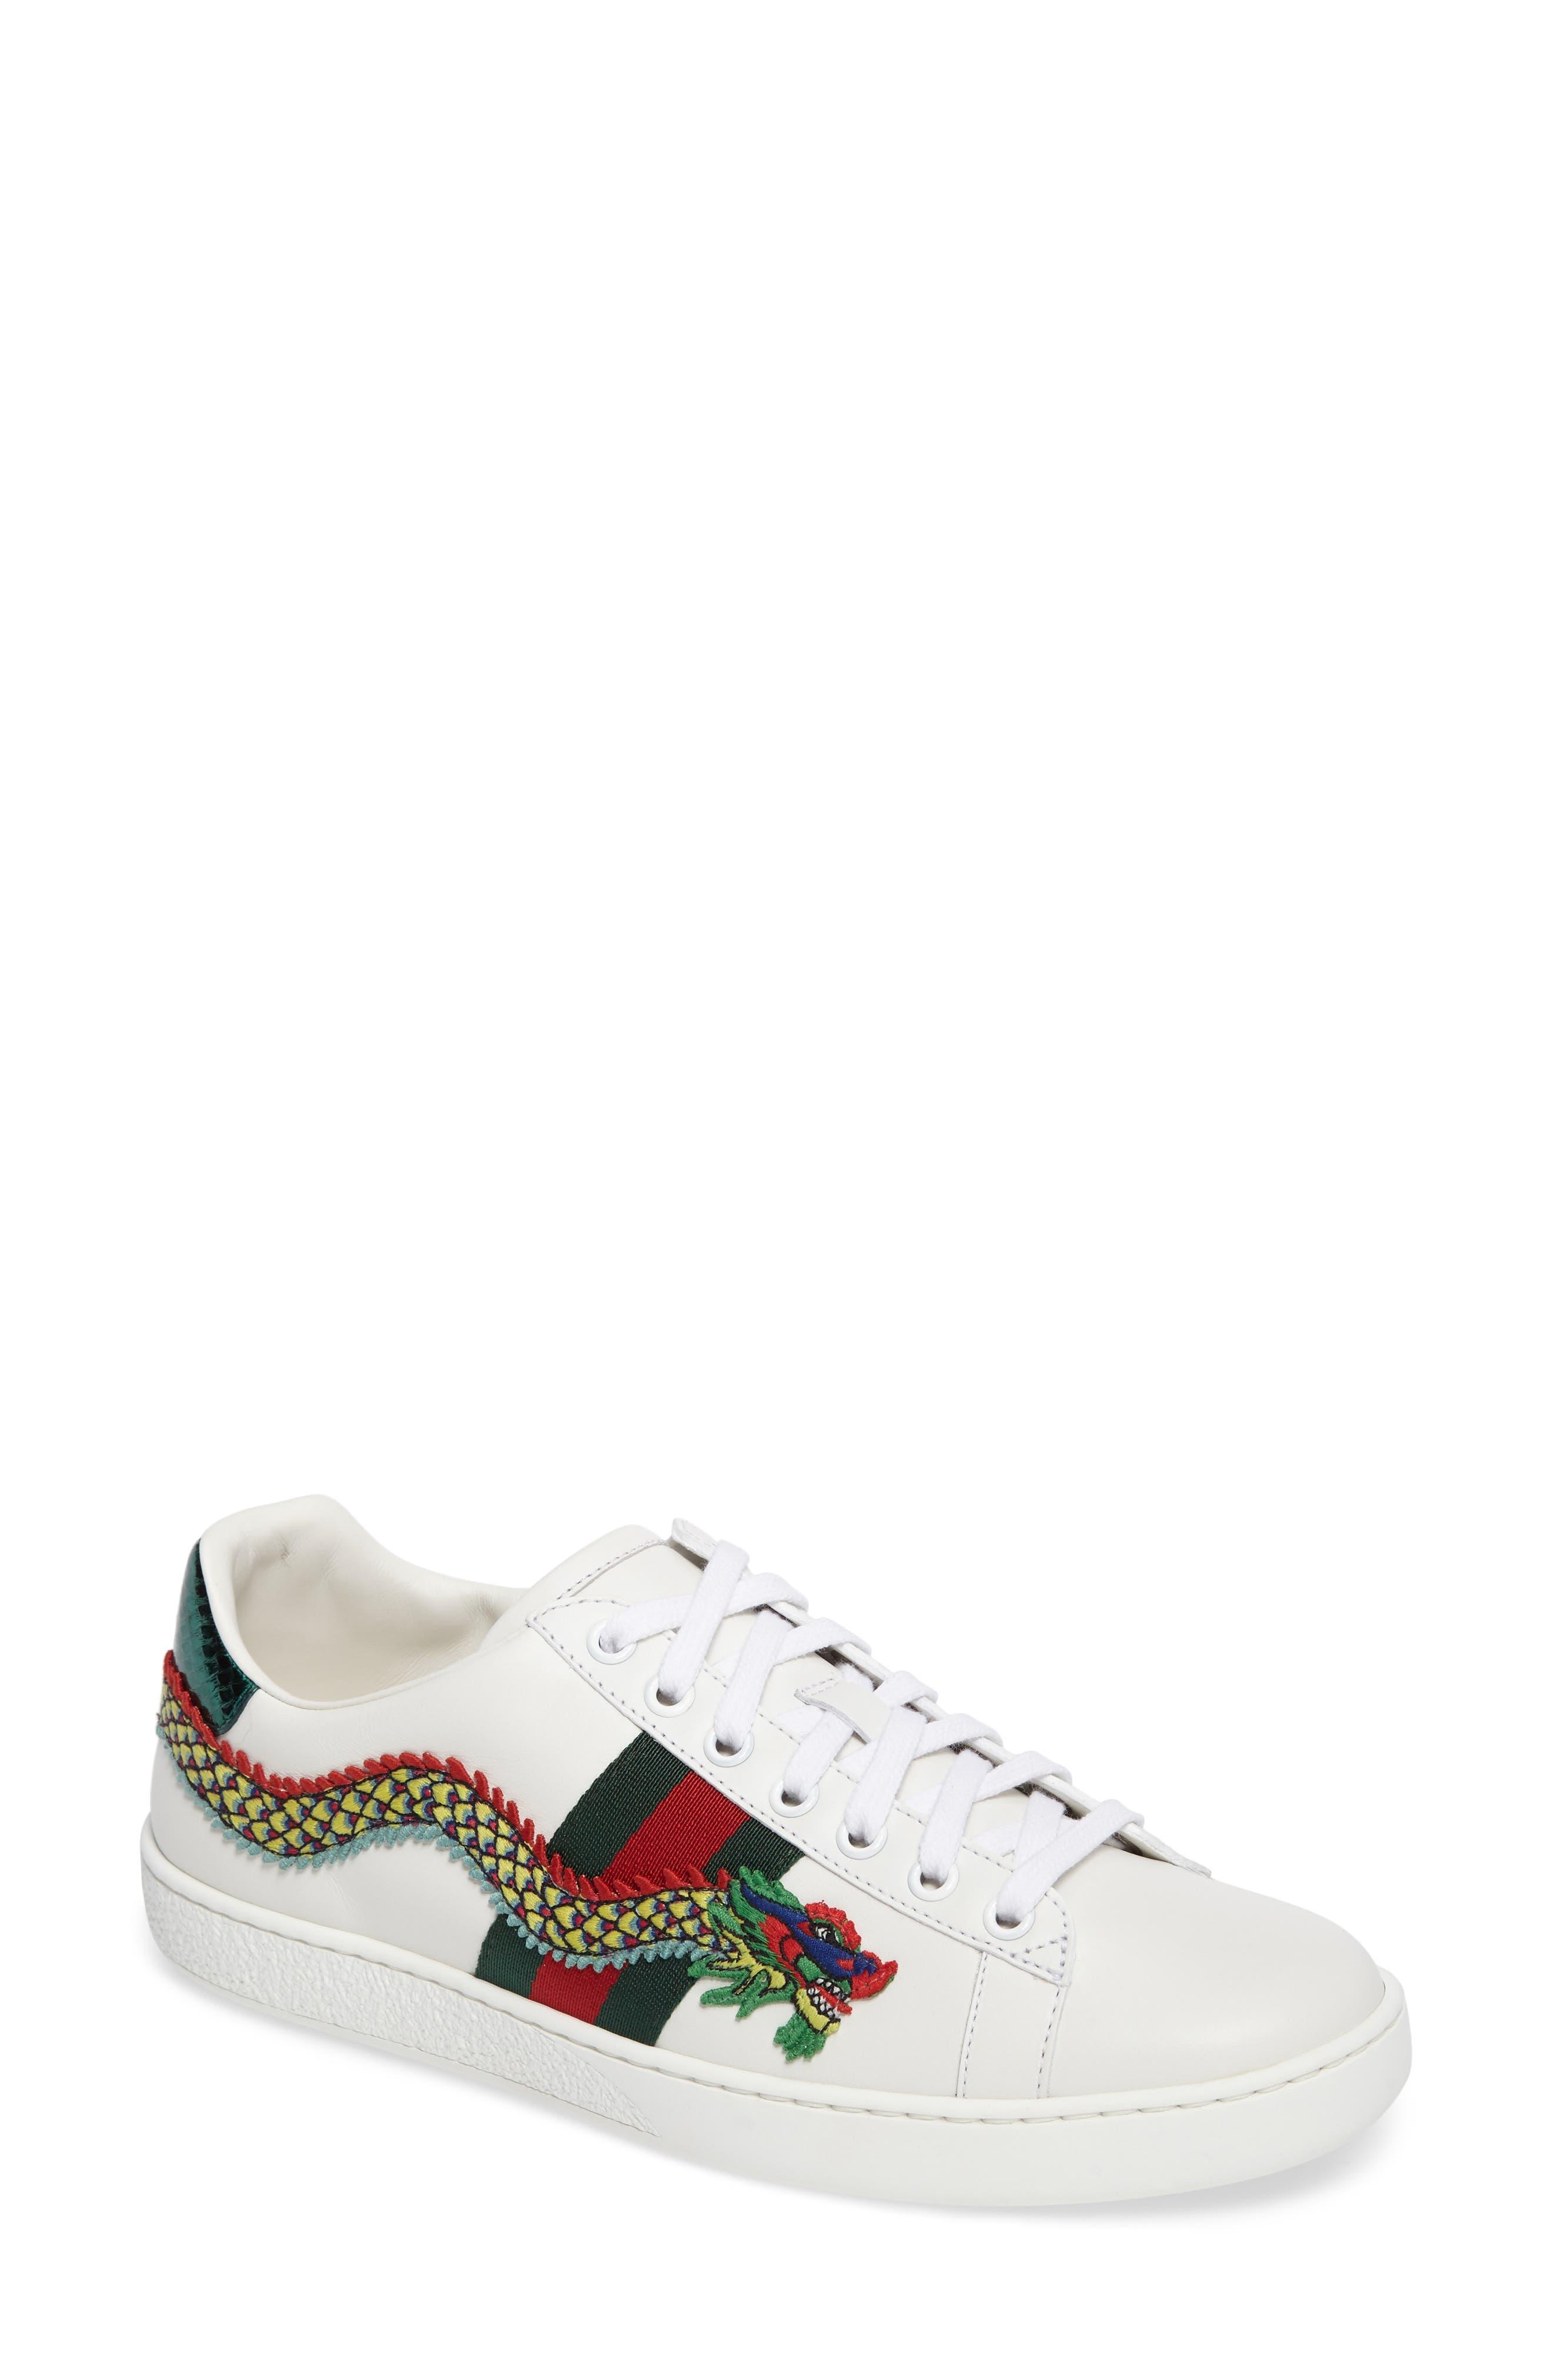 New Ace Dragon Sneaker,                             Main thumbnail 1, color,                             138